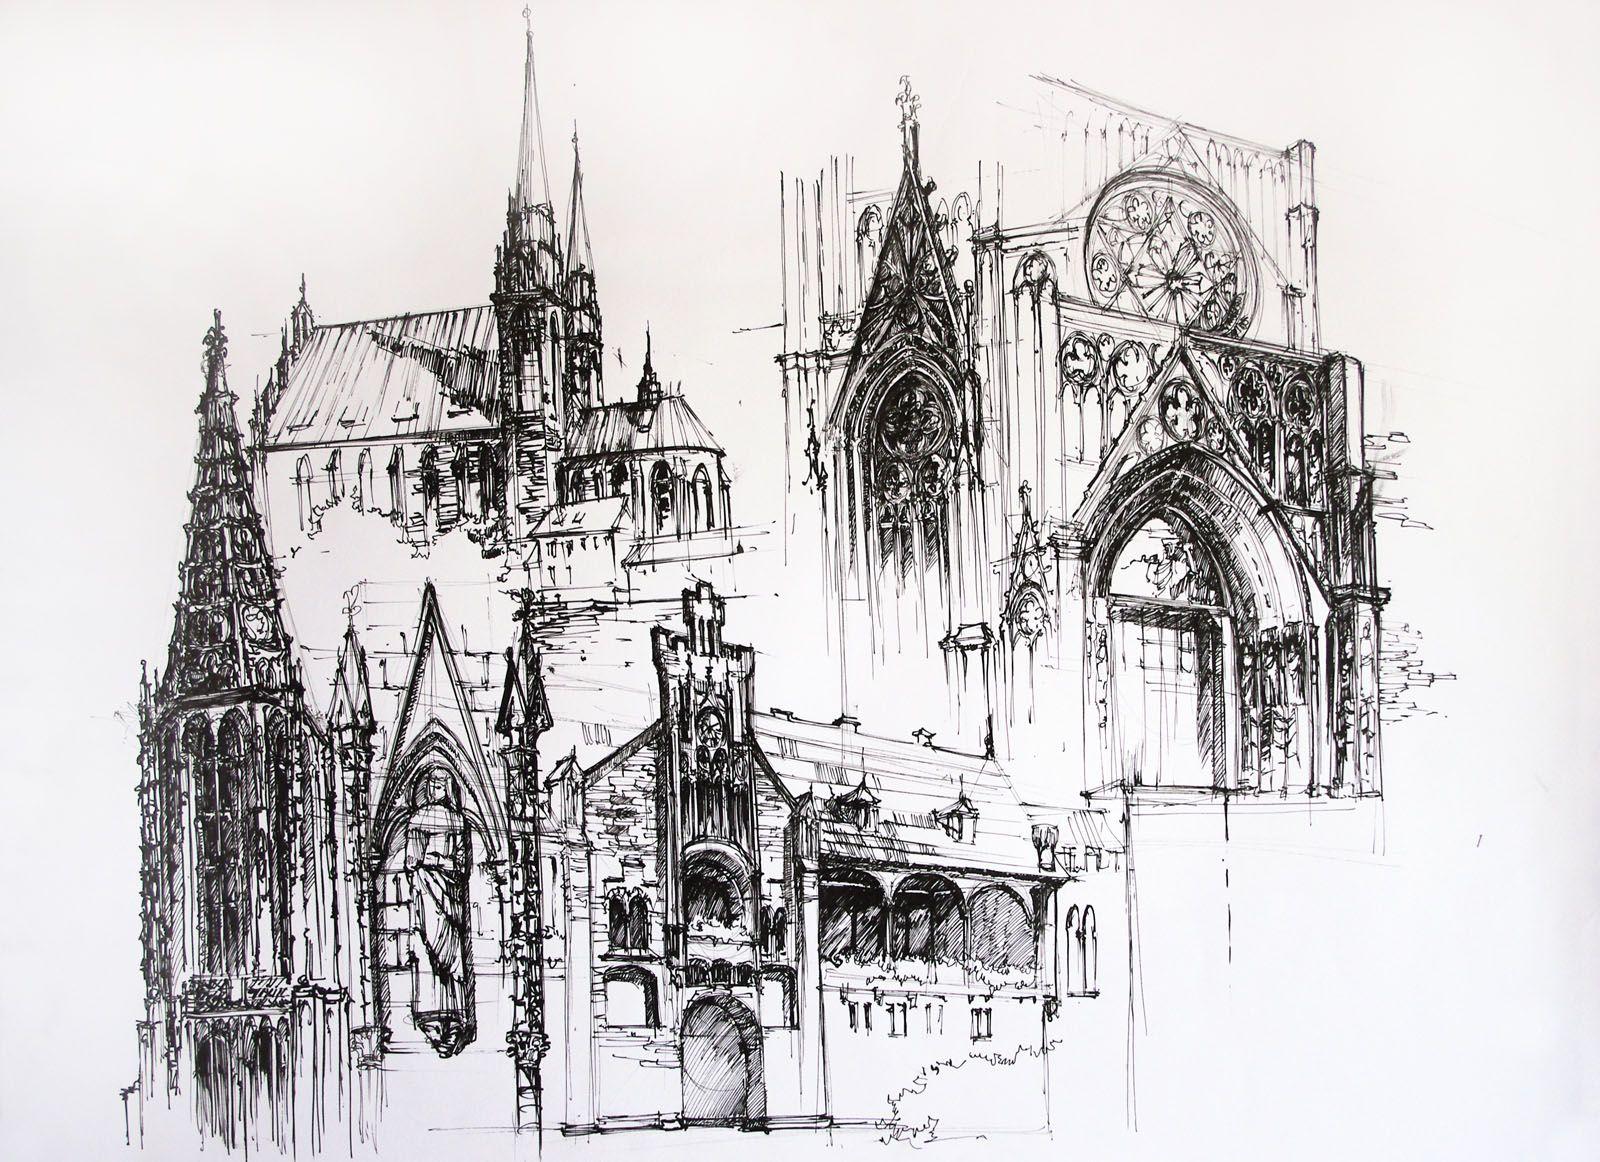 Gothic Architecture By Alphirin On Deviantart Gothic Architecture Drawing Architecture Sketch Architecture Drawing